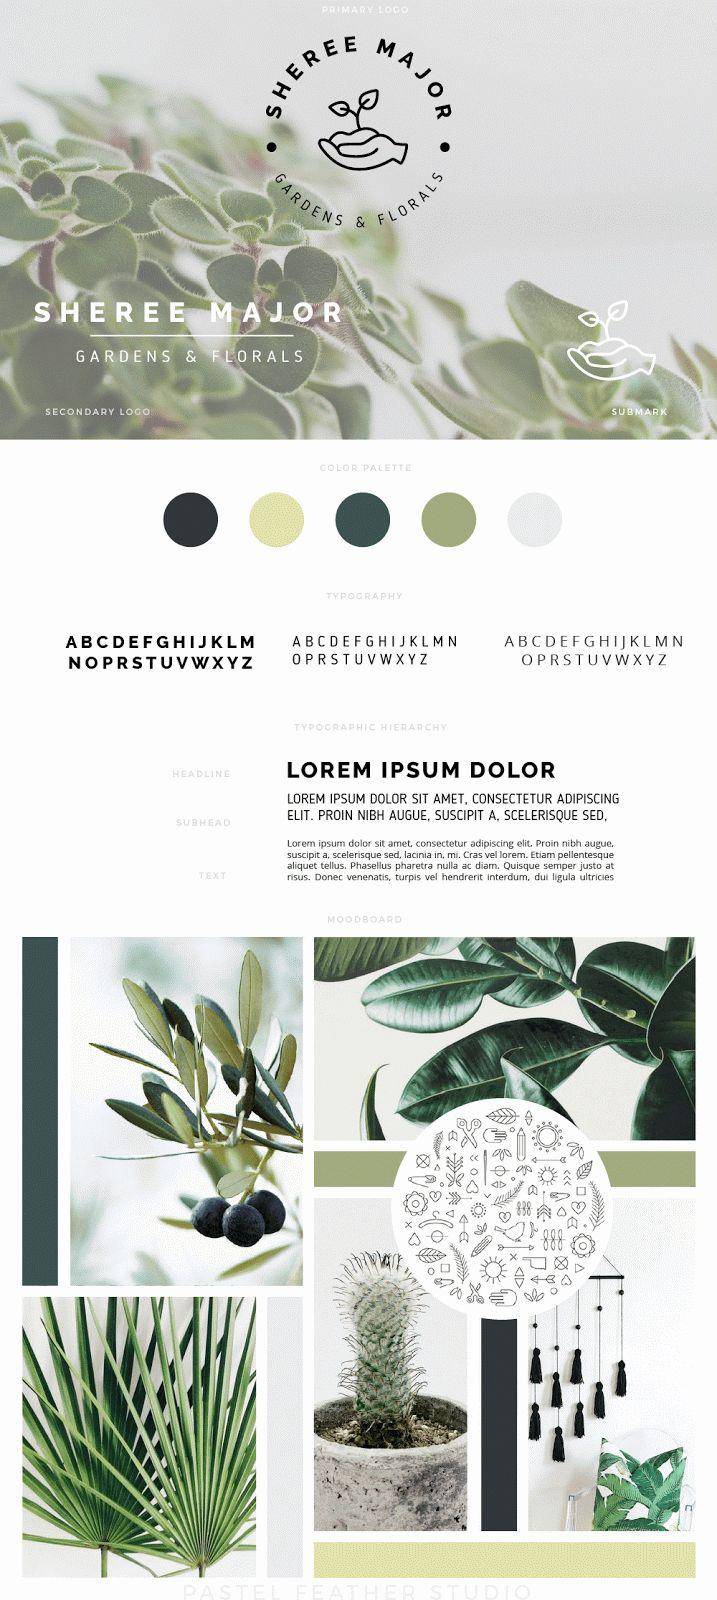 DESIGN WORK - Custom branding service Pastel Feather Studio